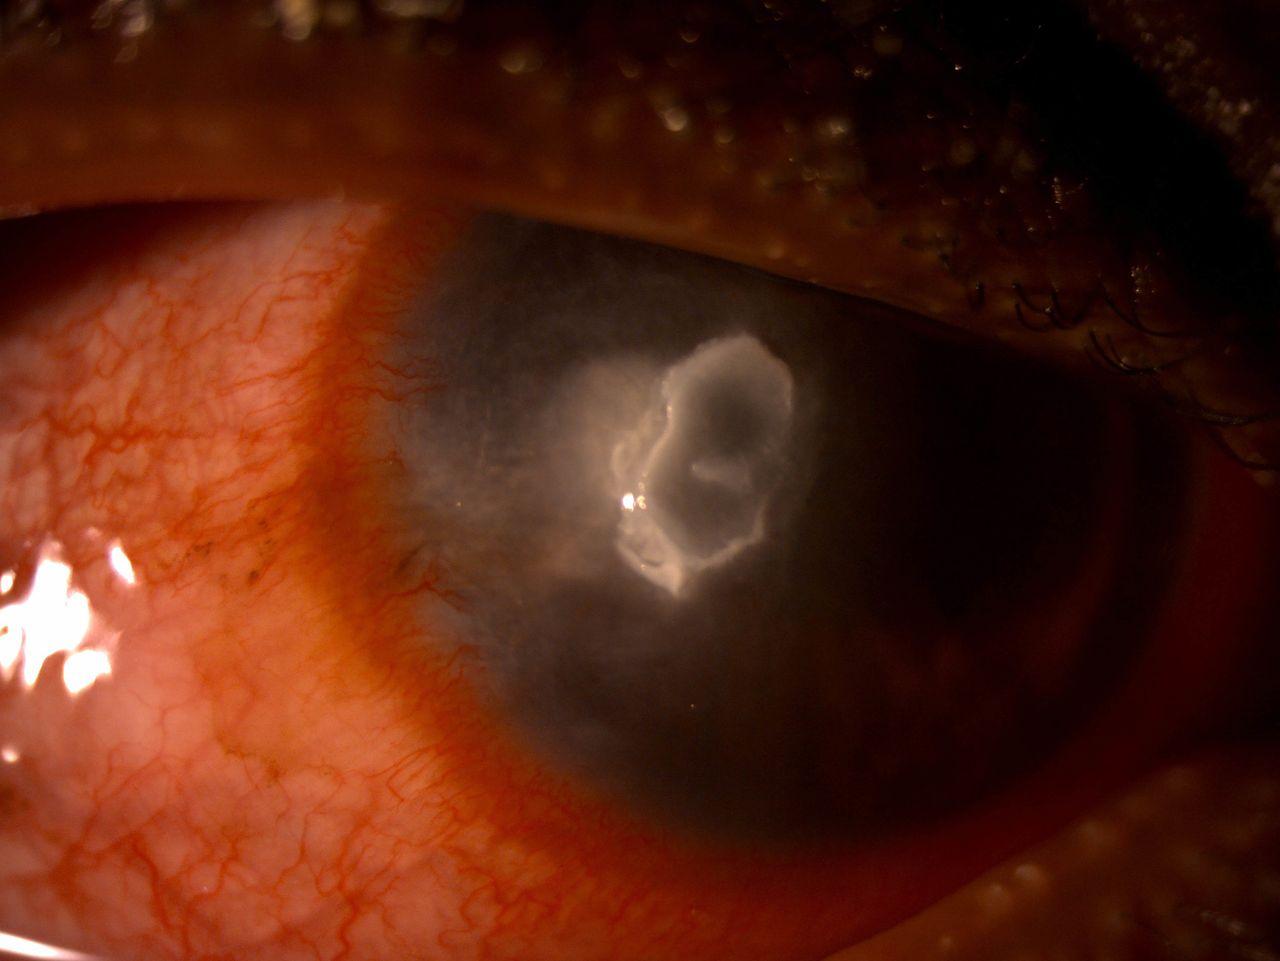 01b255c3b5 Pythium insidiosum and Acanthamoeba keratitis in a contact lens user ...